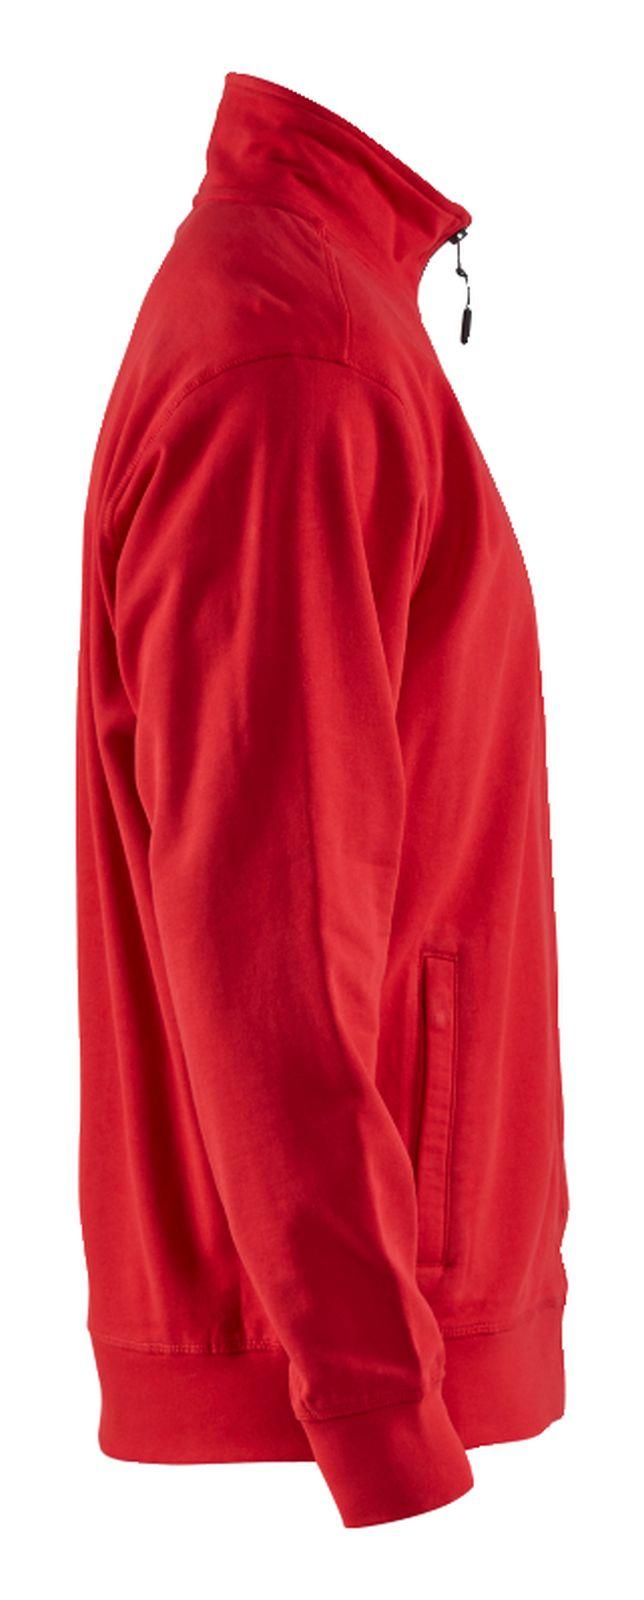 Blaklader Vesten 33711158 rood(5600)